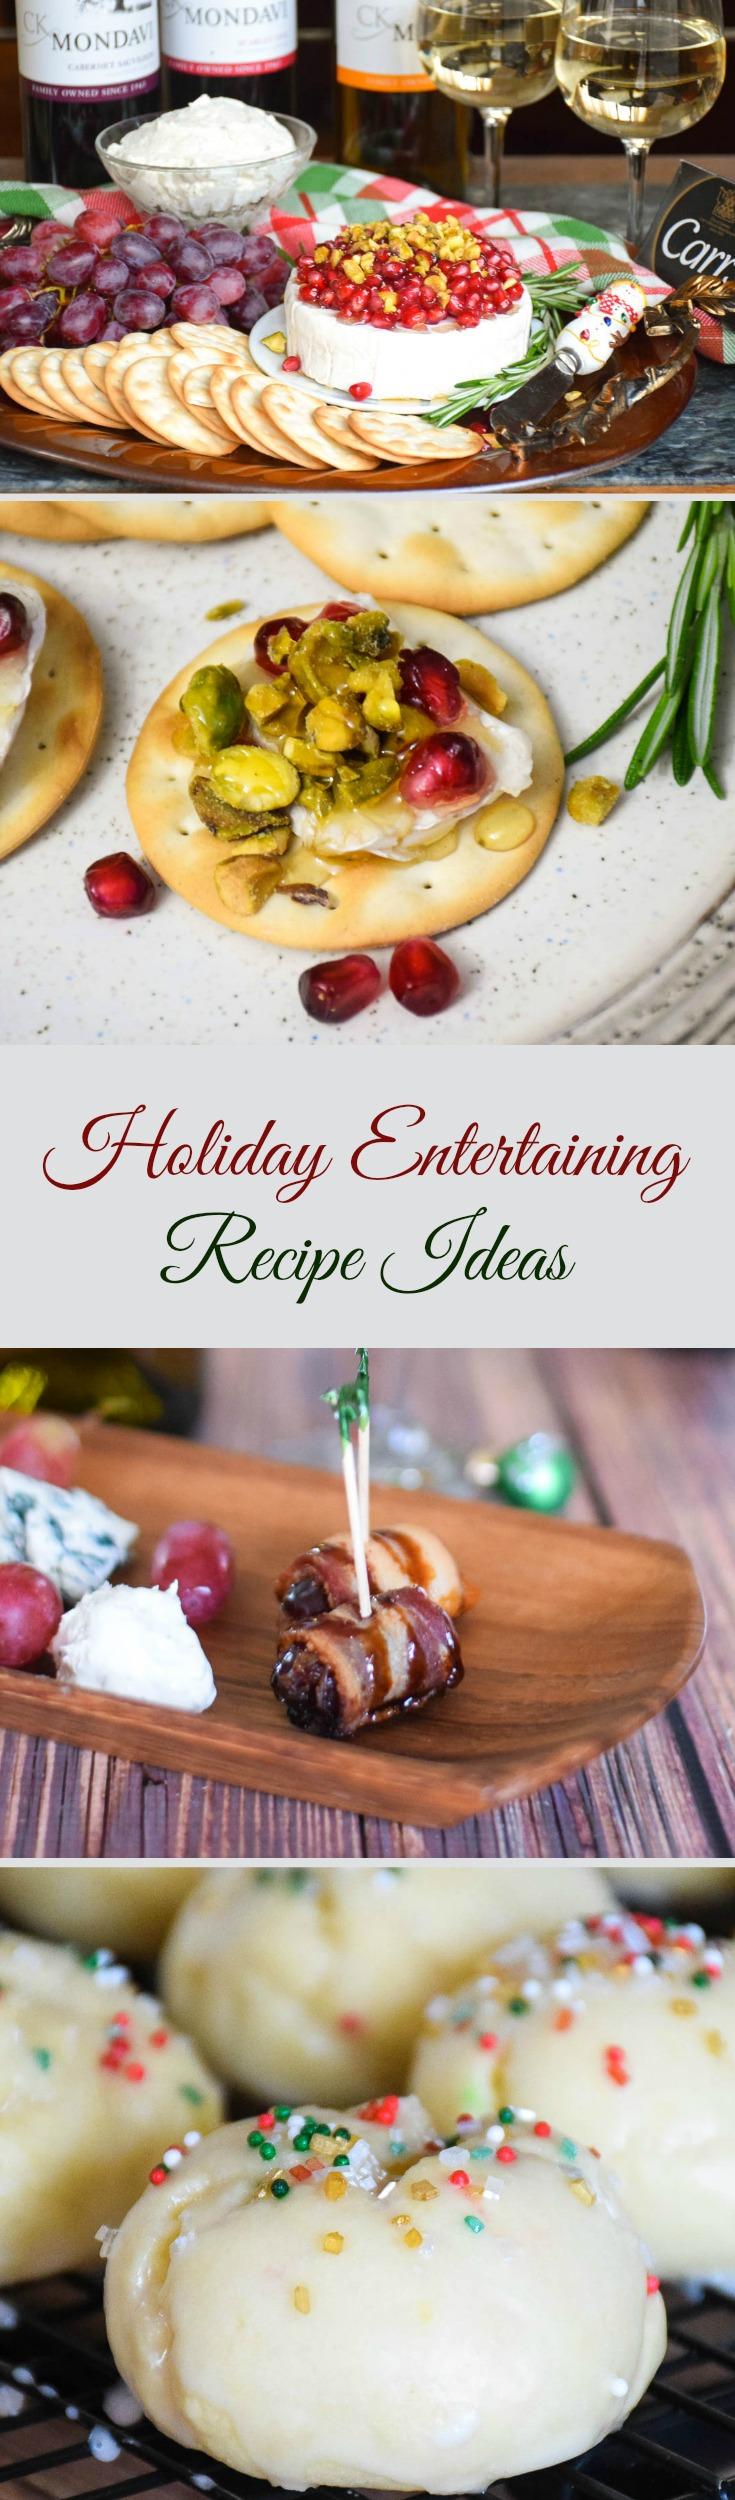 Holiday Entertaining Recipe Ideas